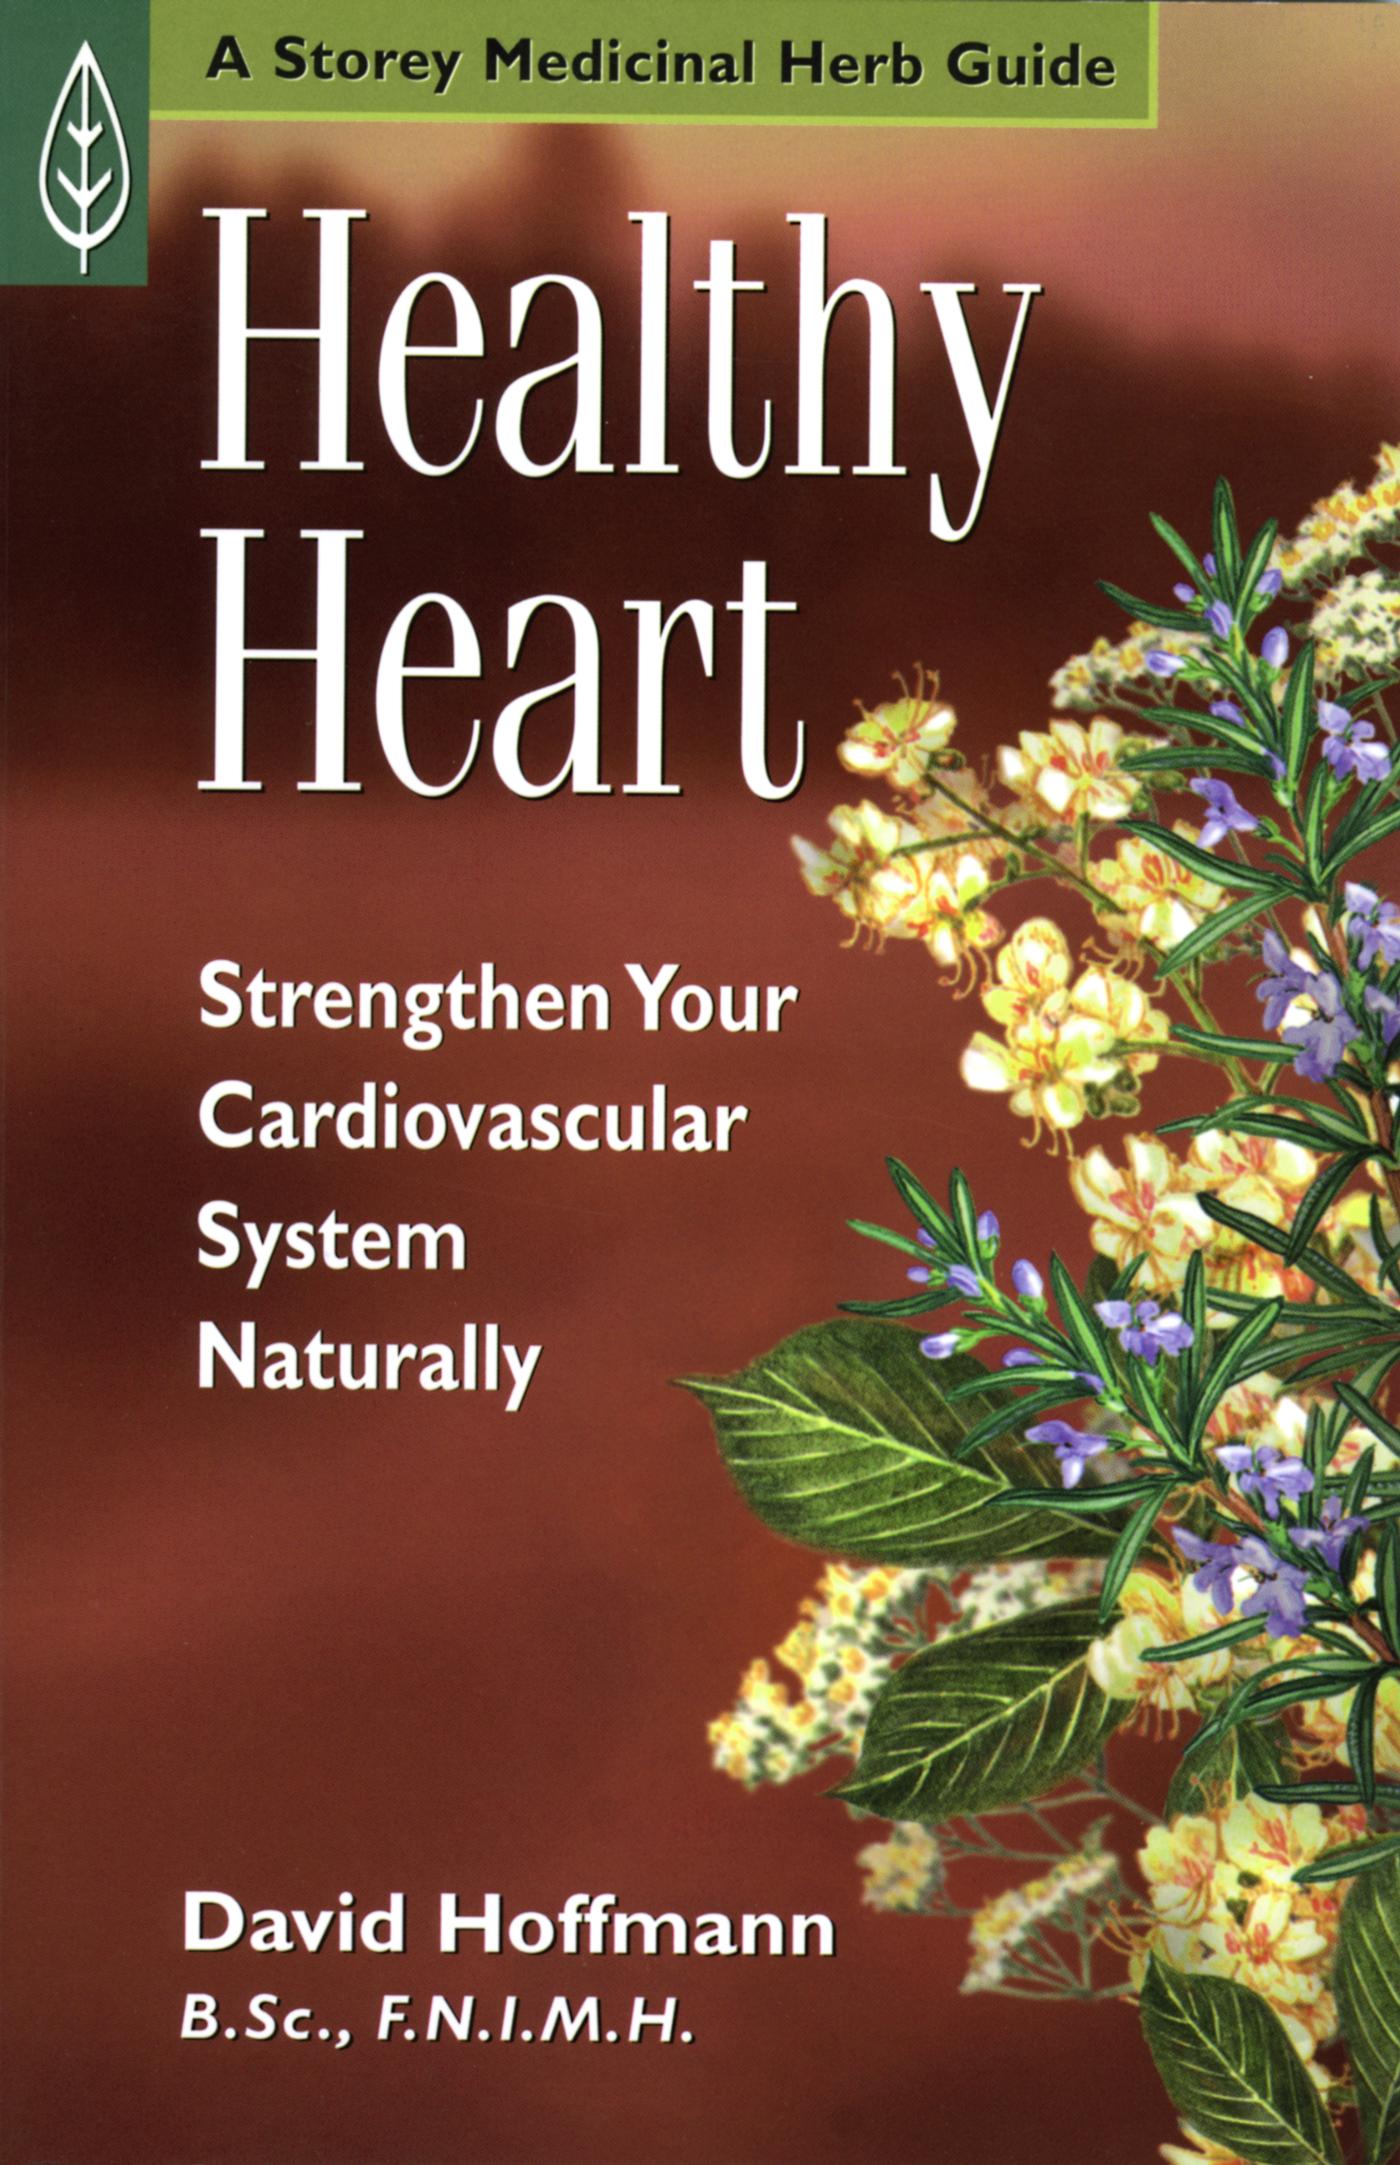 Healthy Heart Strengthen Your Cardiovascular System Naturally - David Hoffmann